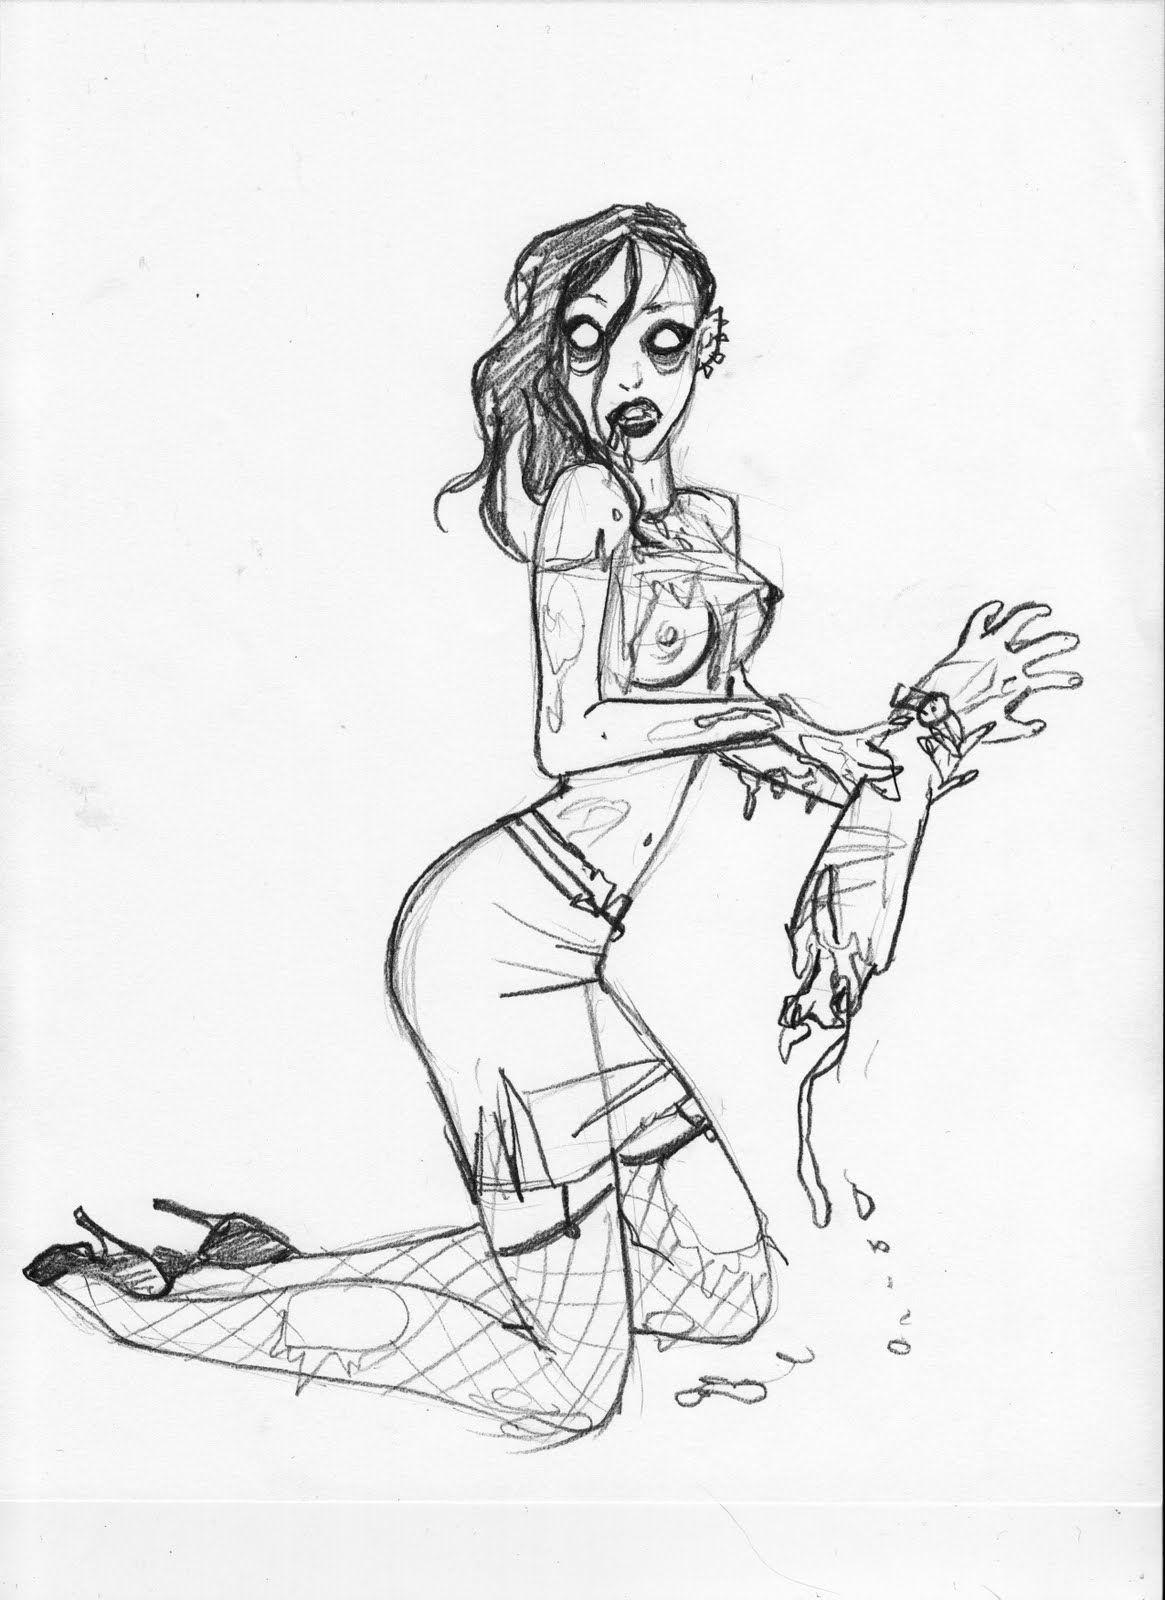 Pin by Cindy Alvarez on Zombie Art & Color Pages | Pinterest ...